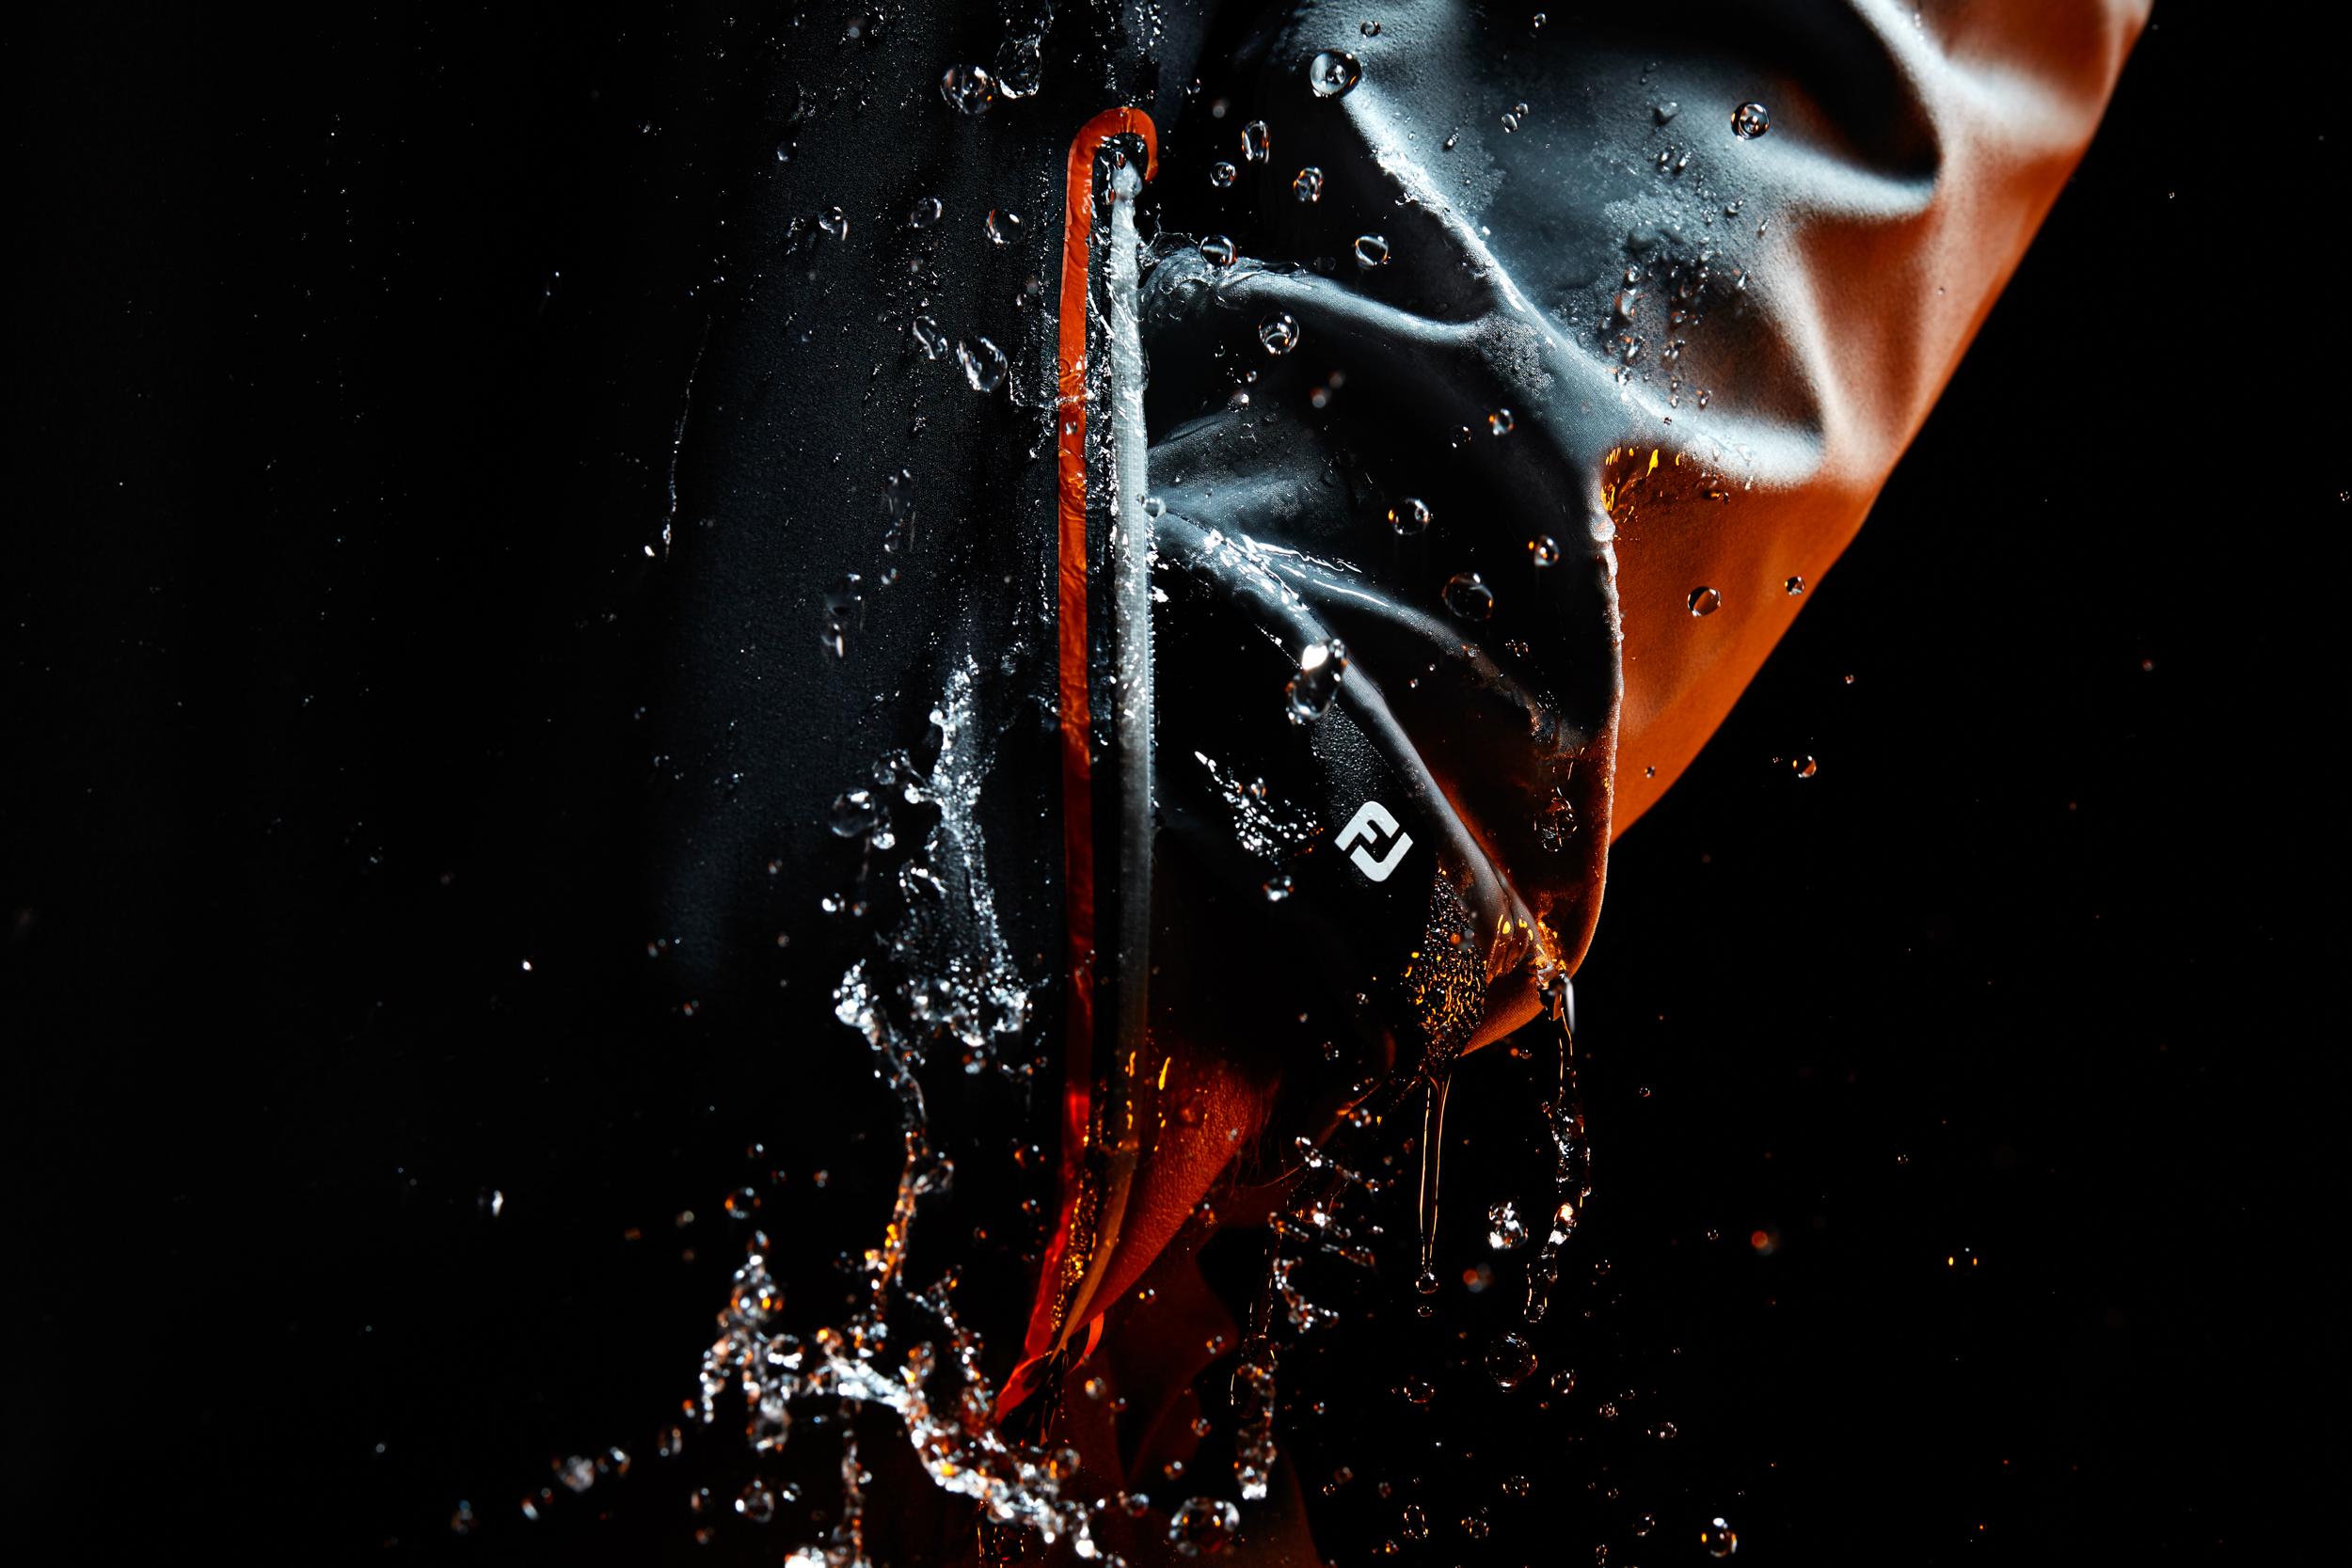 180310_FootJoy_Splash_Test_311_RT.jpg